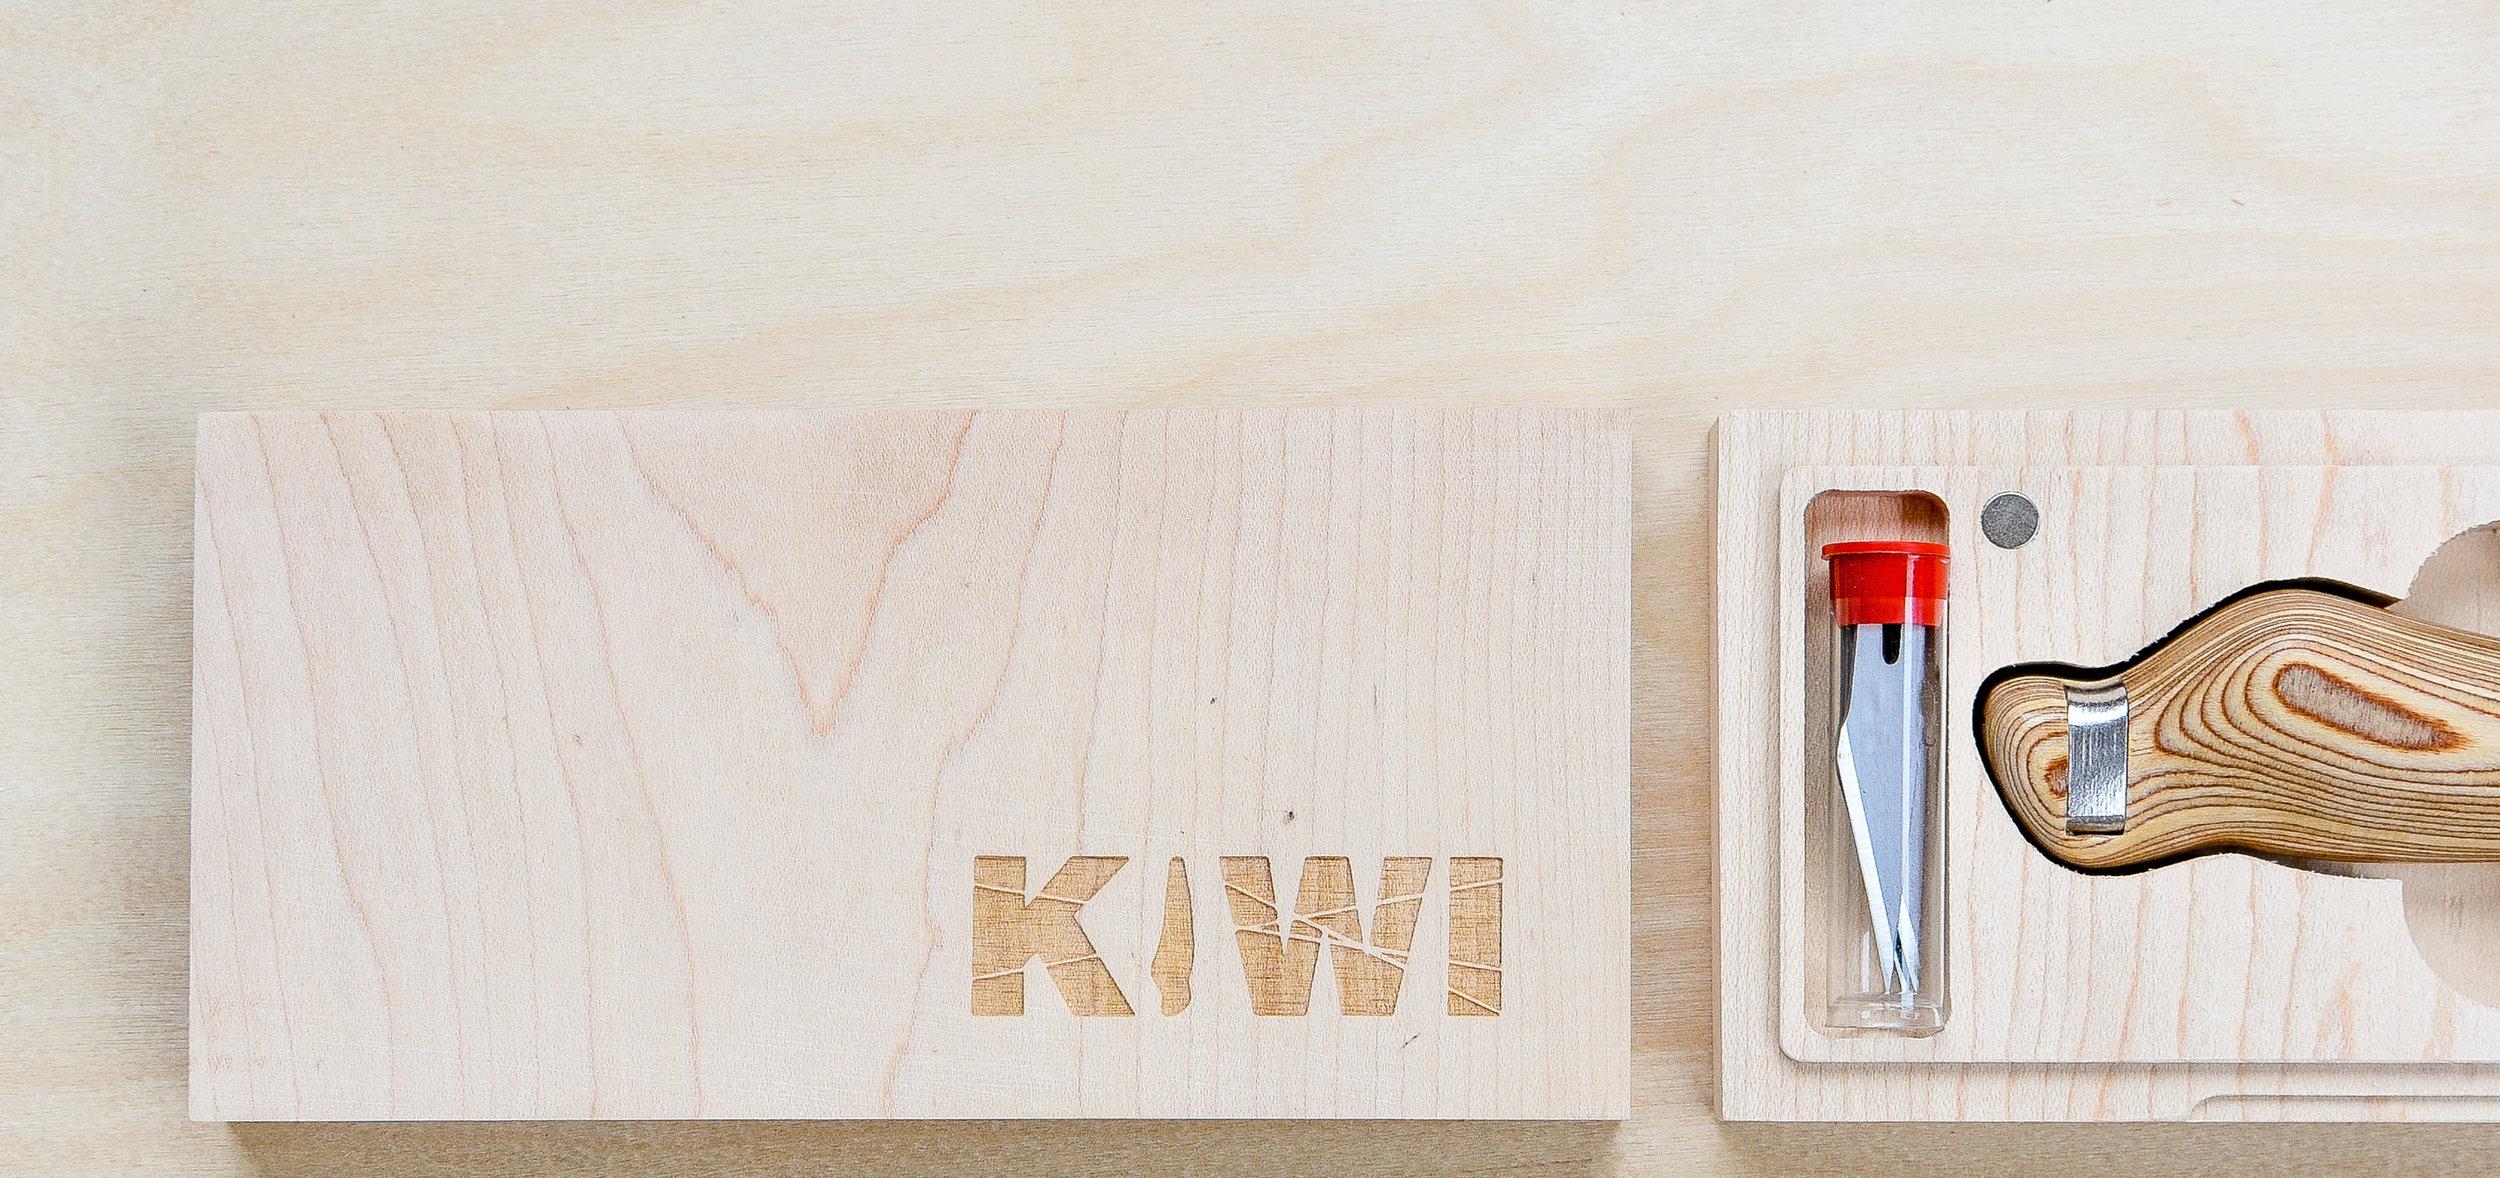 Kiwi Carrier